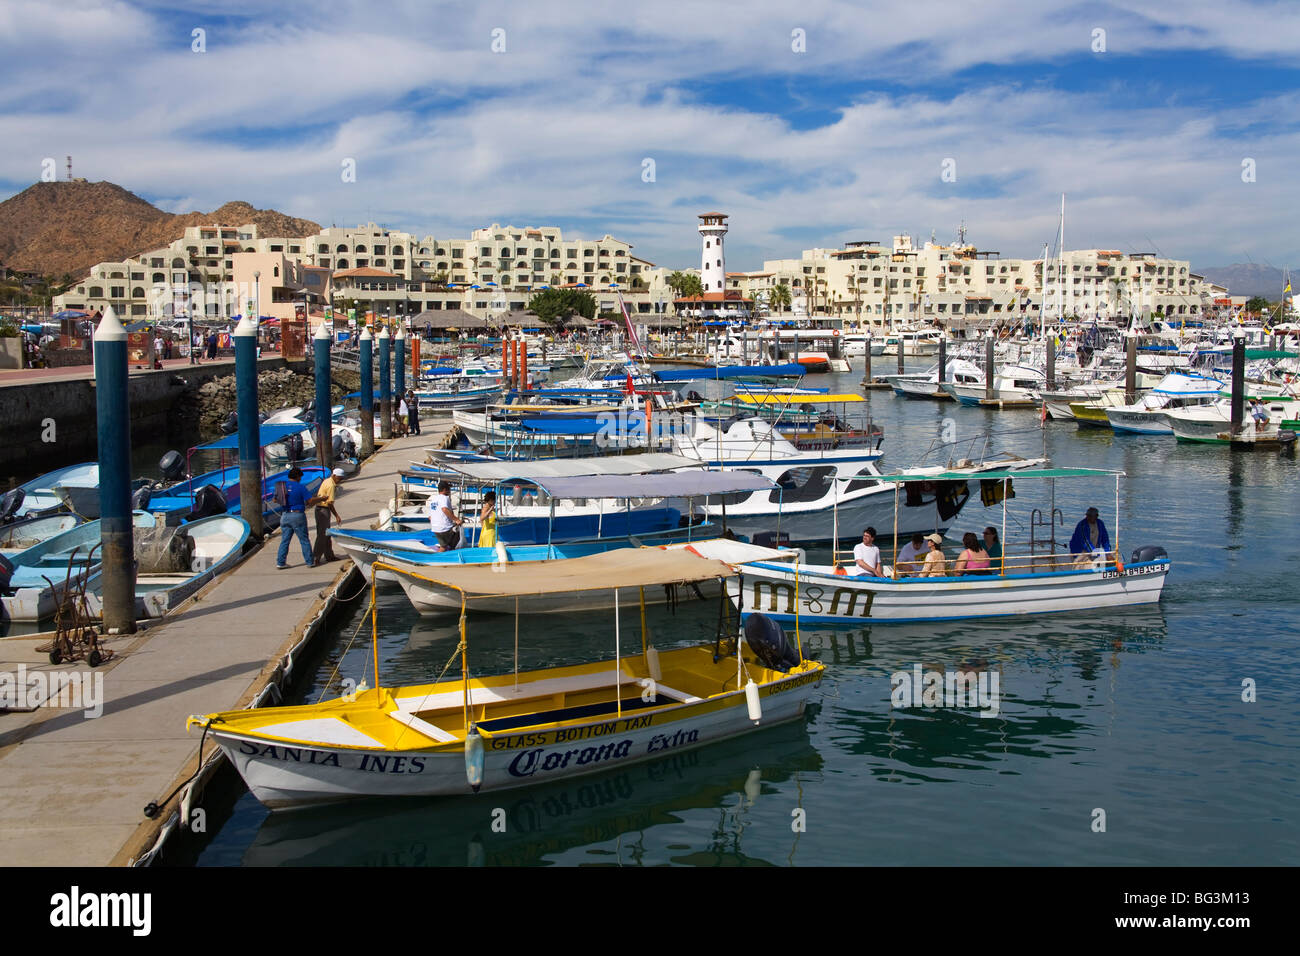 Marina, Cabo San Lucas, Baja California, Mexico, North America - Stock Image